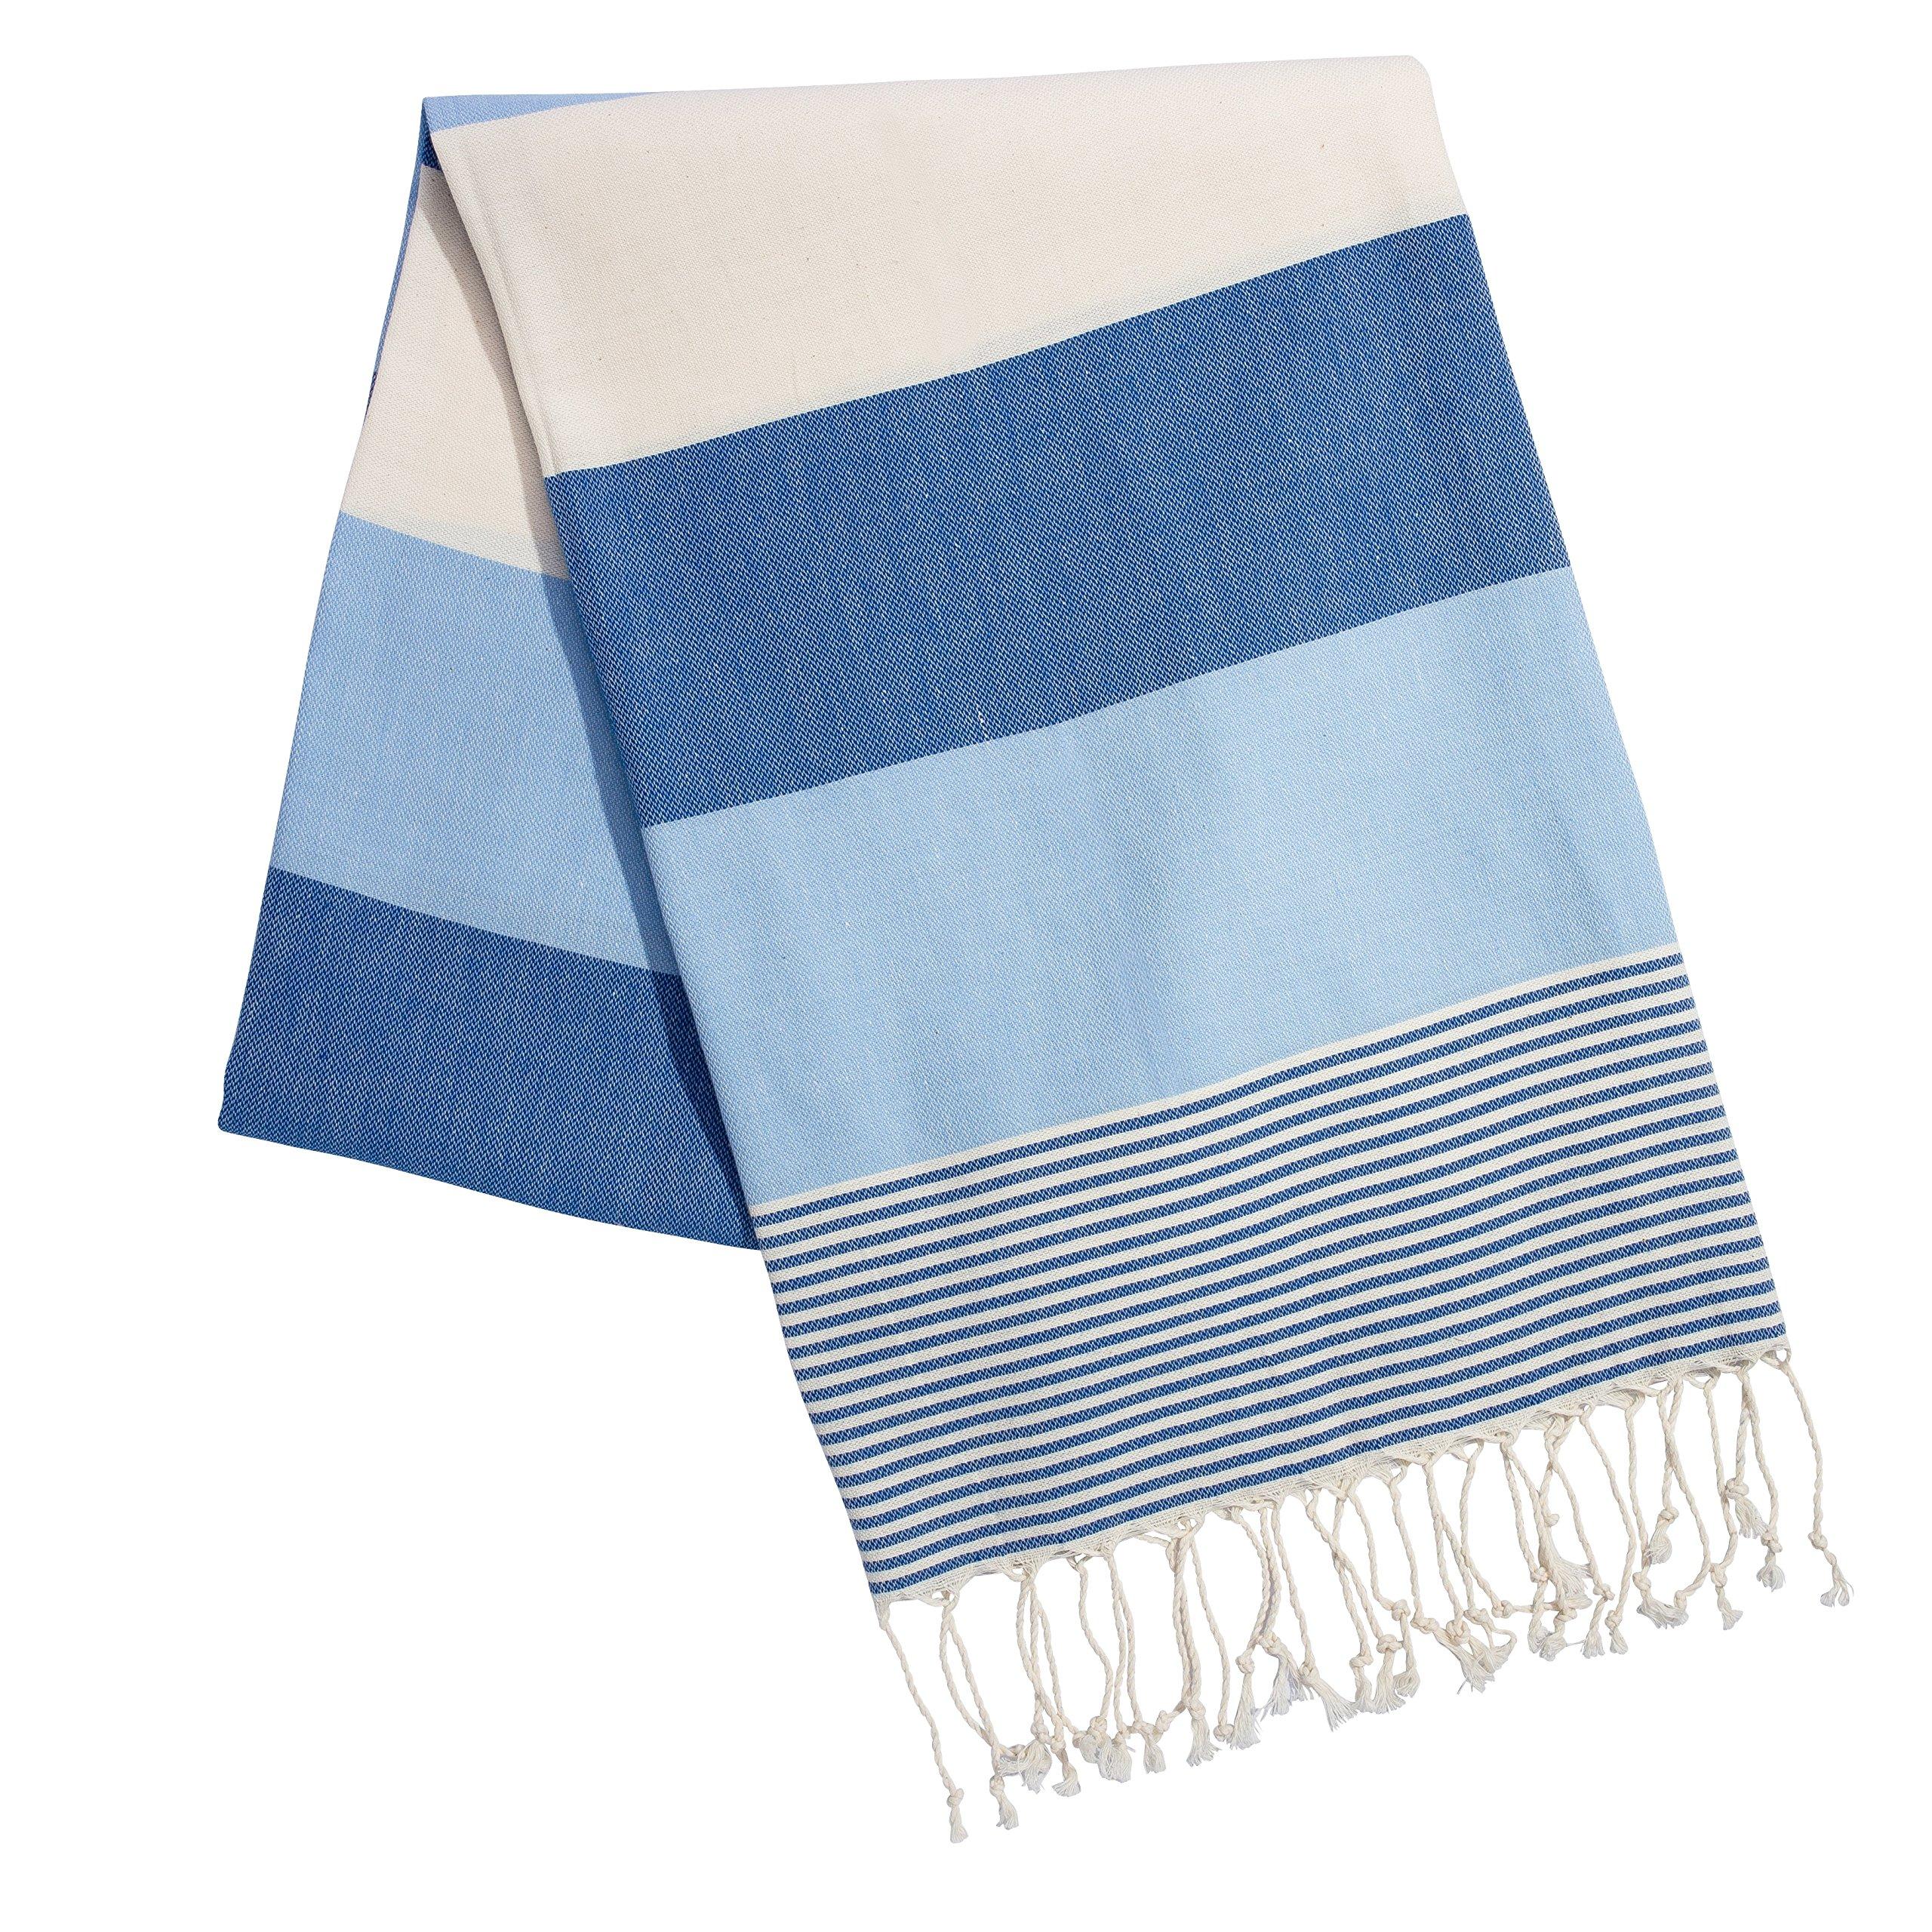 TASTE DRINK GO Large Scarf Turkish Towel Peshtemal lightweight Sarong 100% Cotton